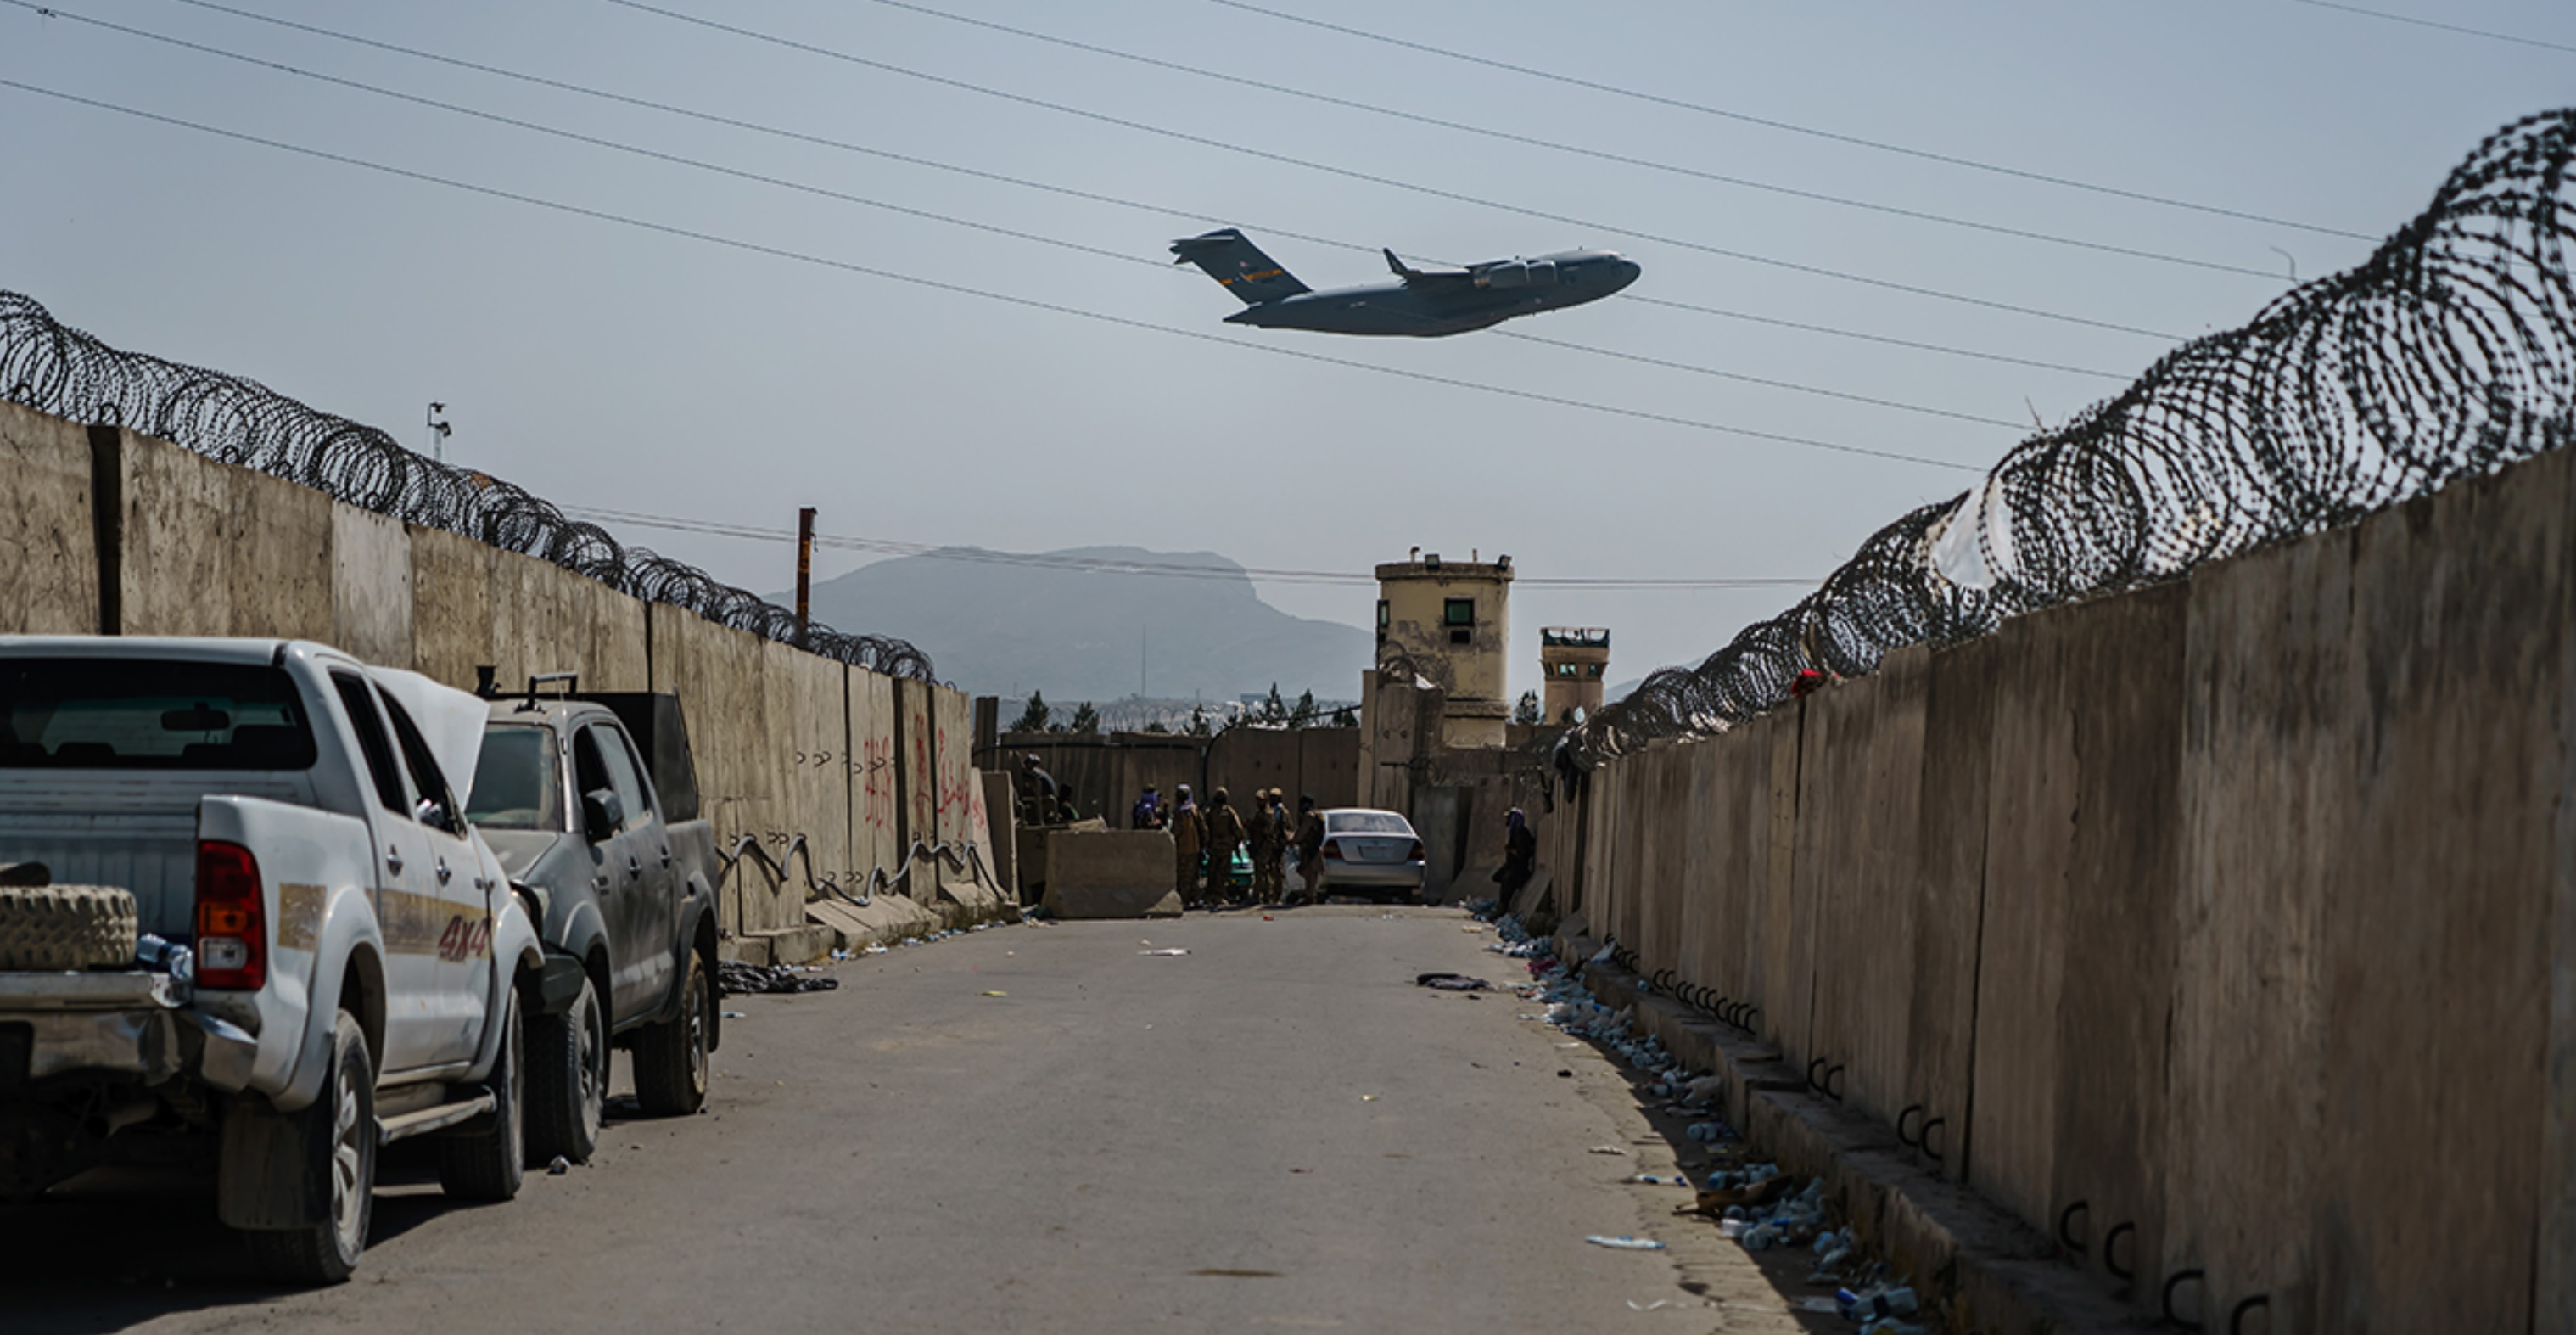 2021-08-31 C17 Globemaster Leaving Kabul International Airport